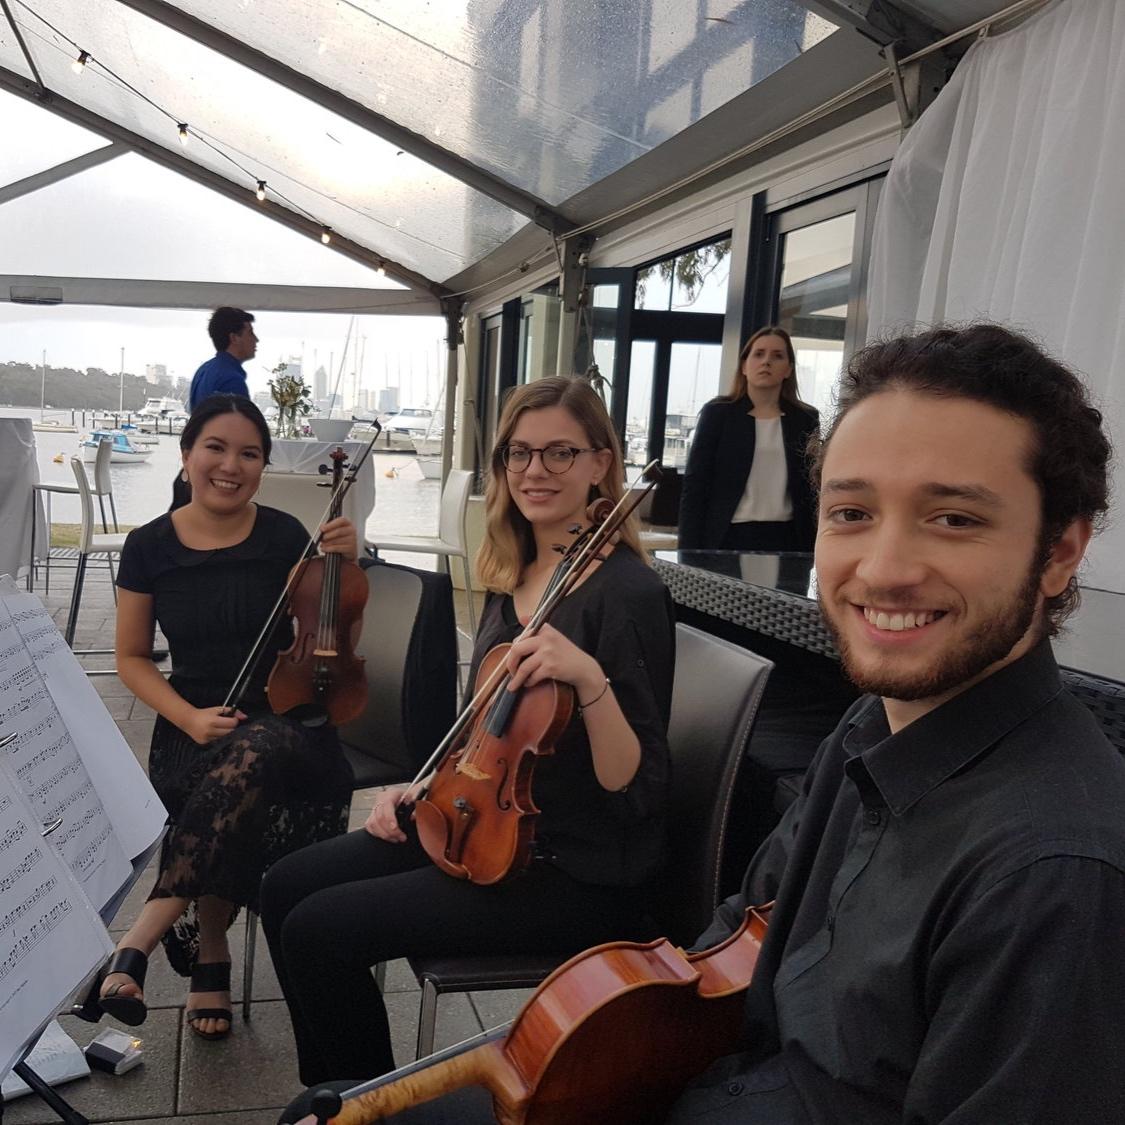 perth-function-string-music-hire-wedding-riverside-musiciansperth-function-string-music-hire-wedding-riverside-musicians-classical-contemporary-quartet-violins-viola-cellist